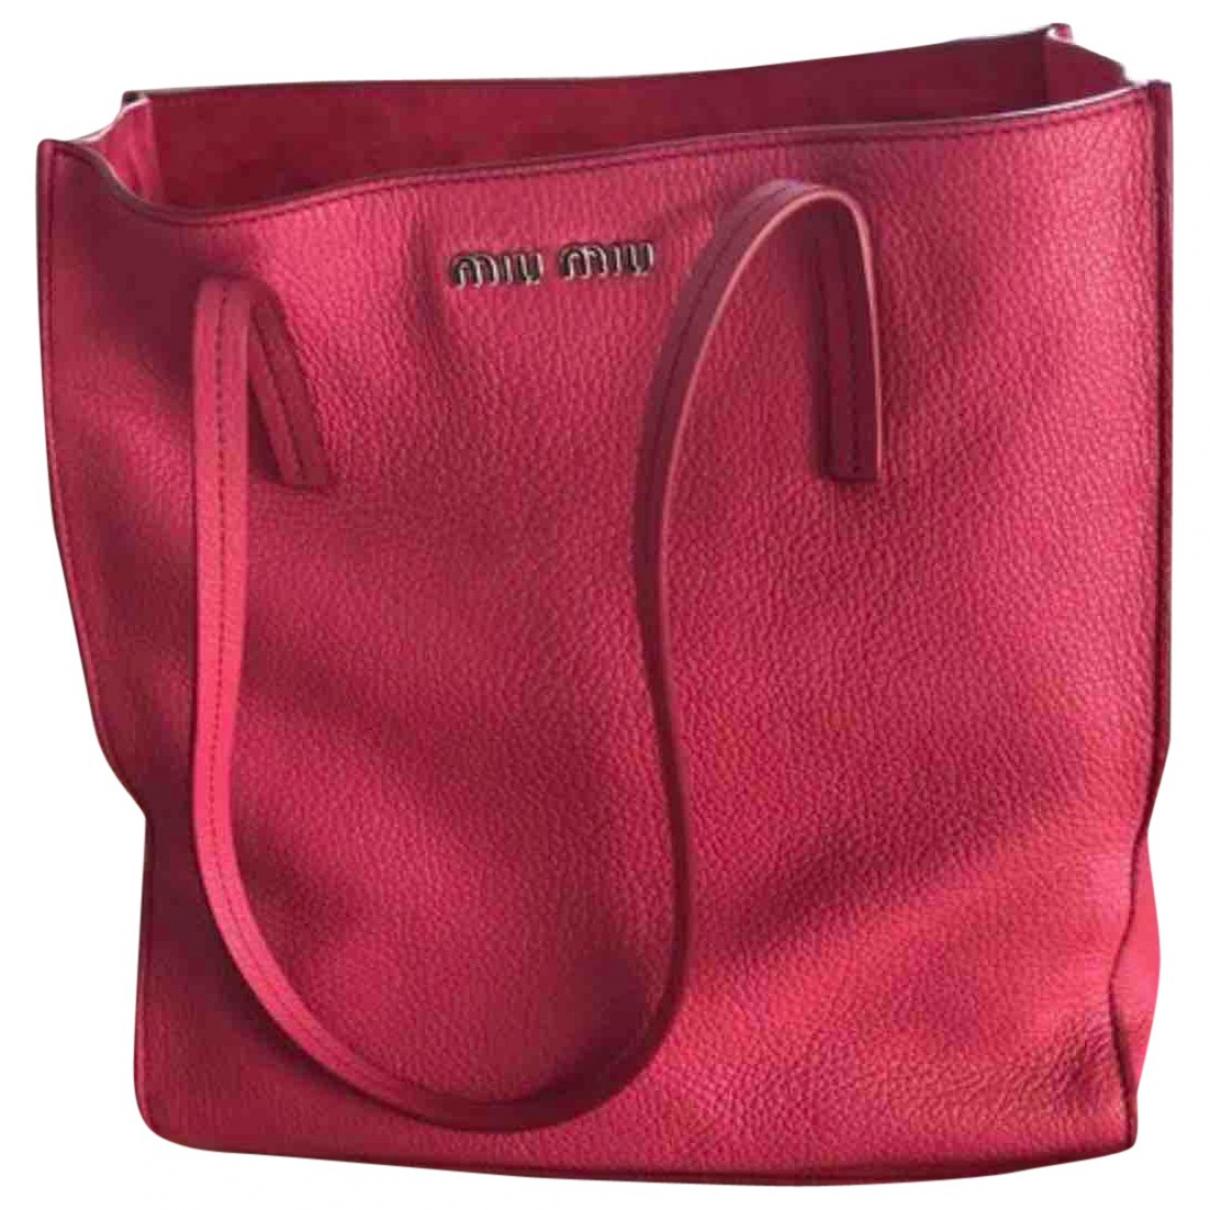 Miu Miu - Sac a main   pour femme en cuir - rose